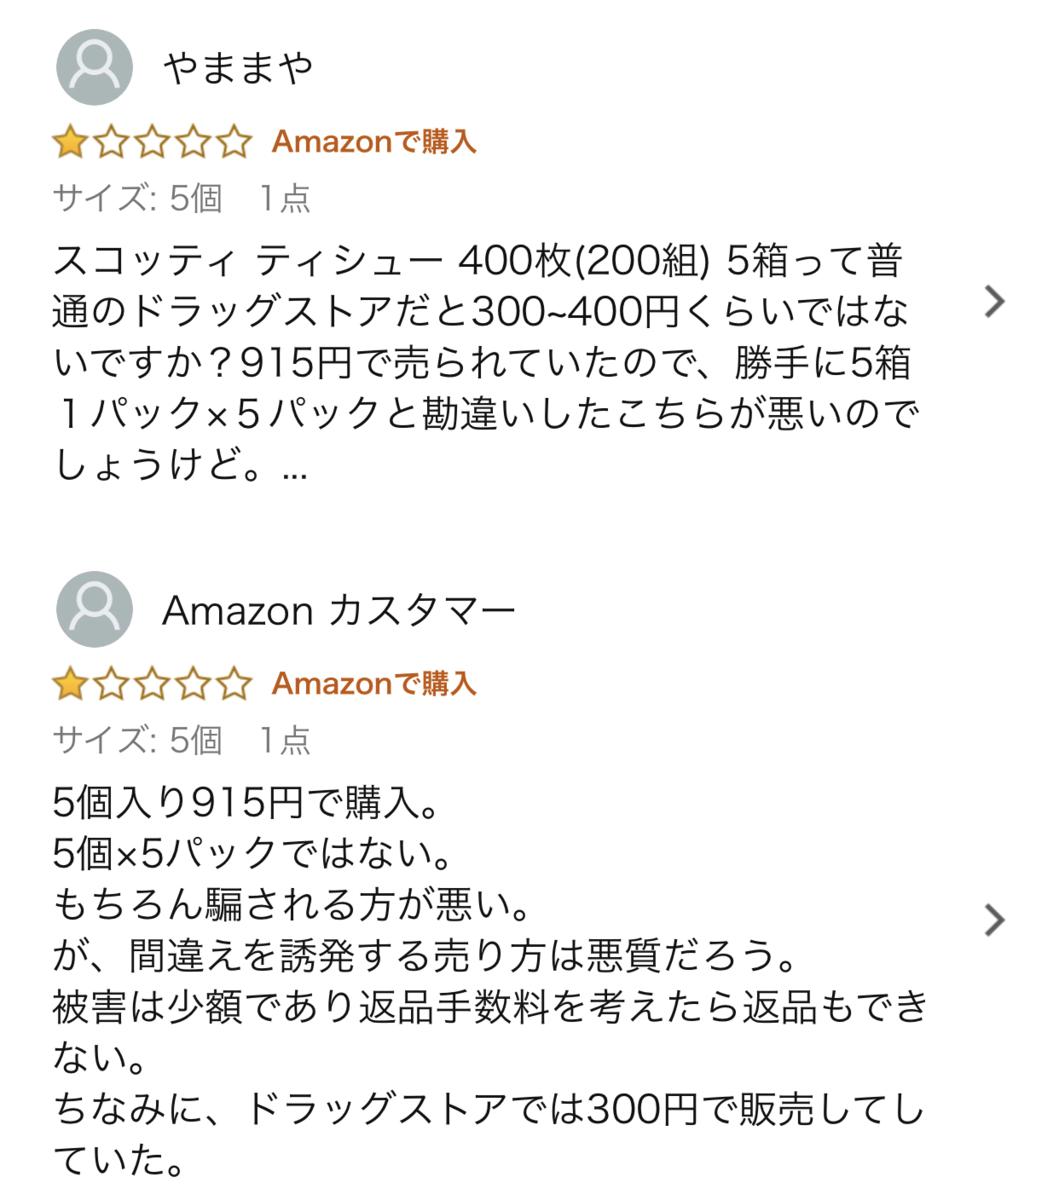 f:id:hardshopper:20190630011544p:plain